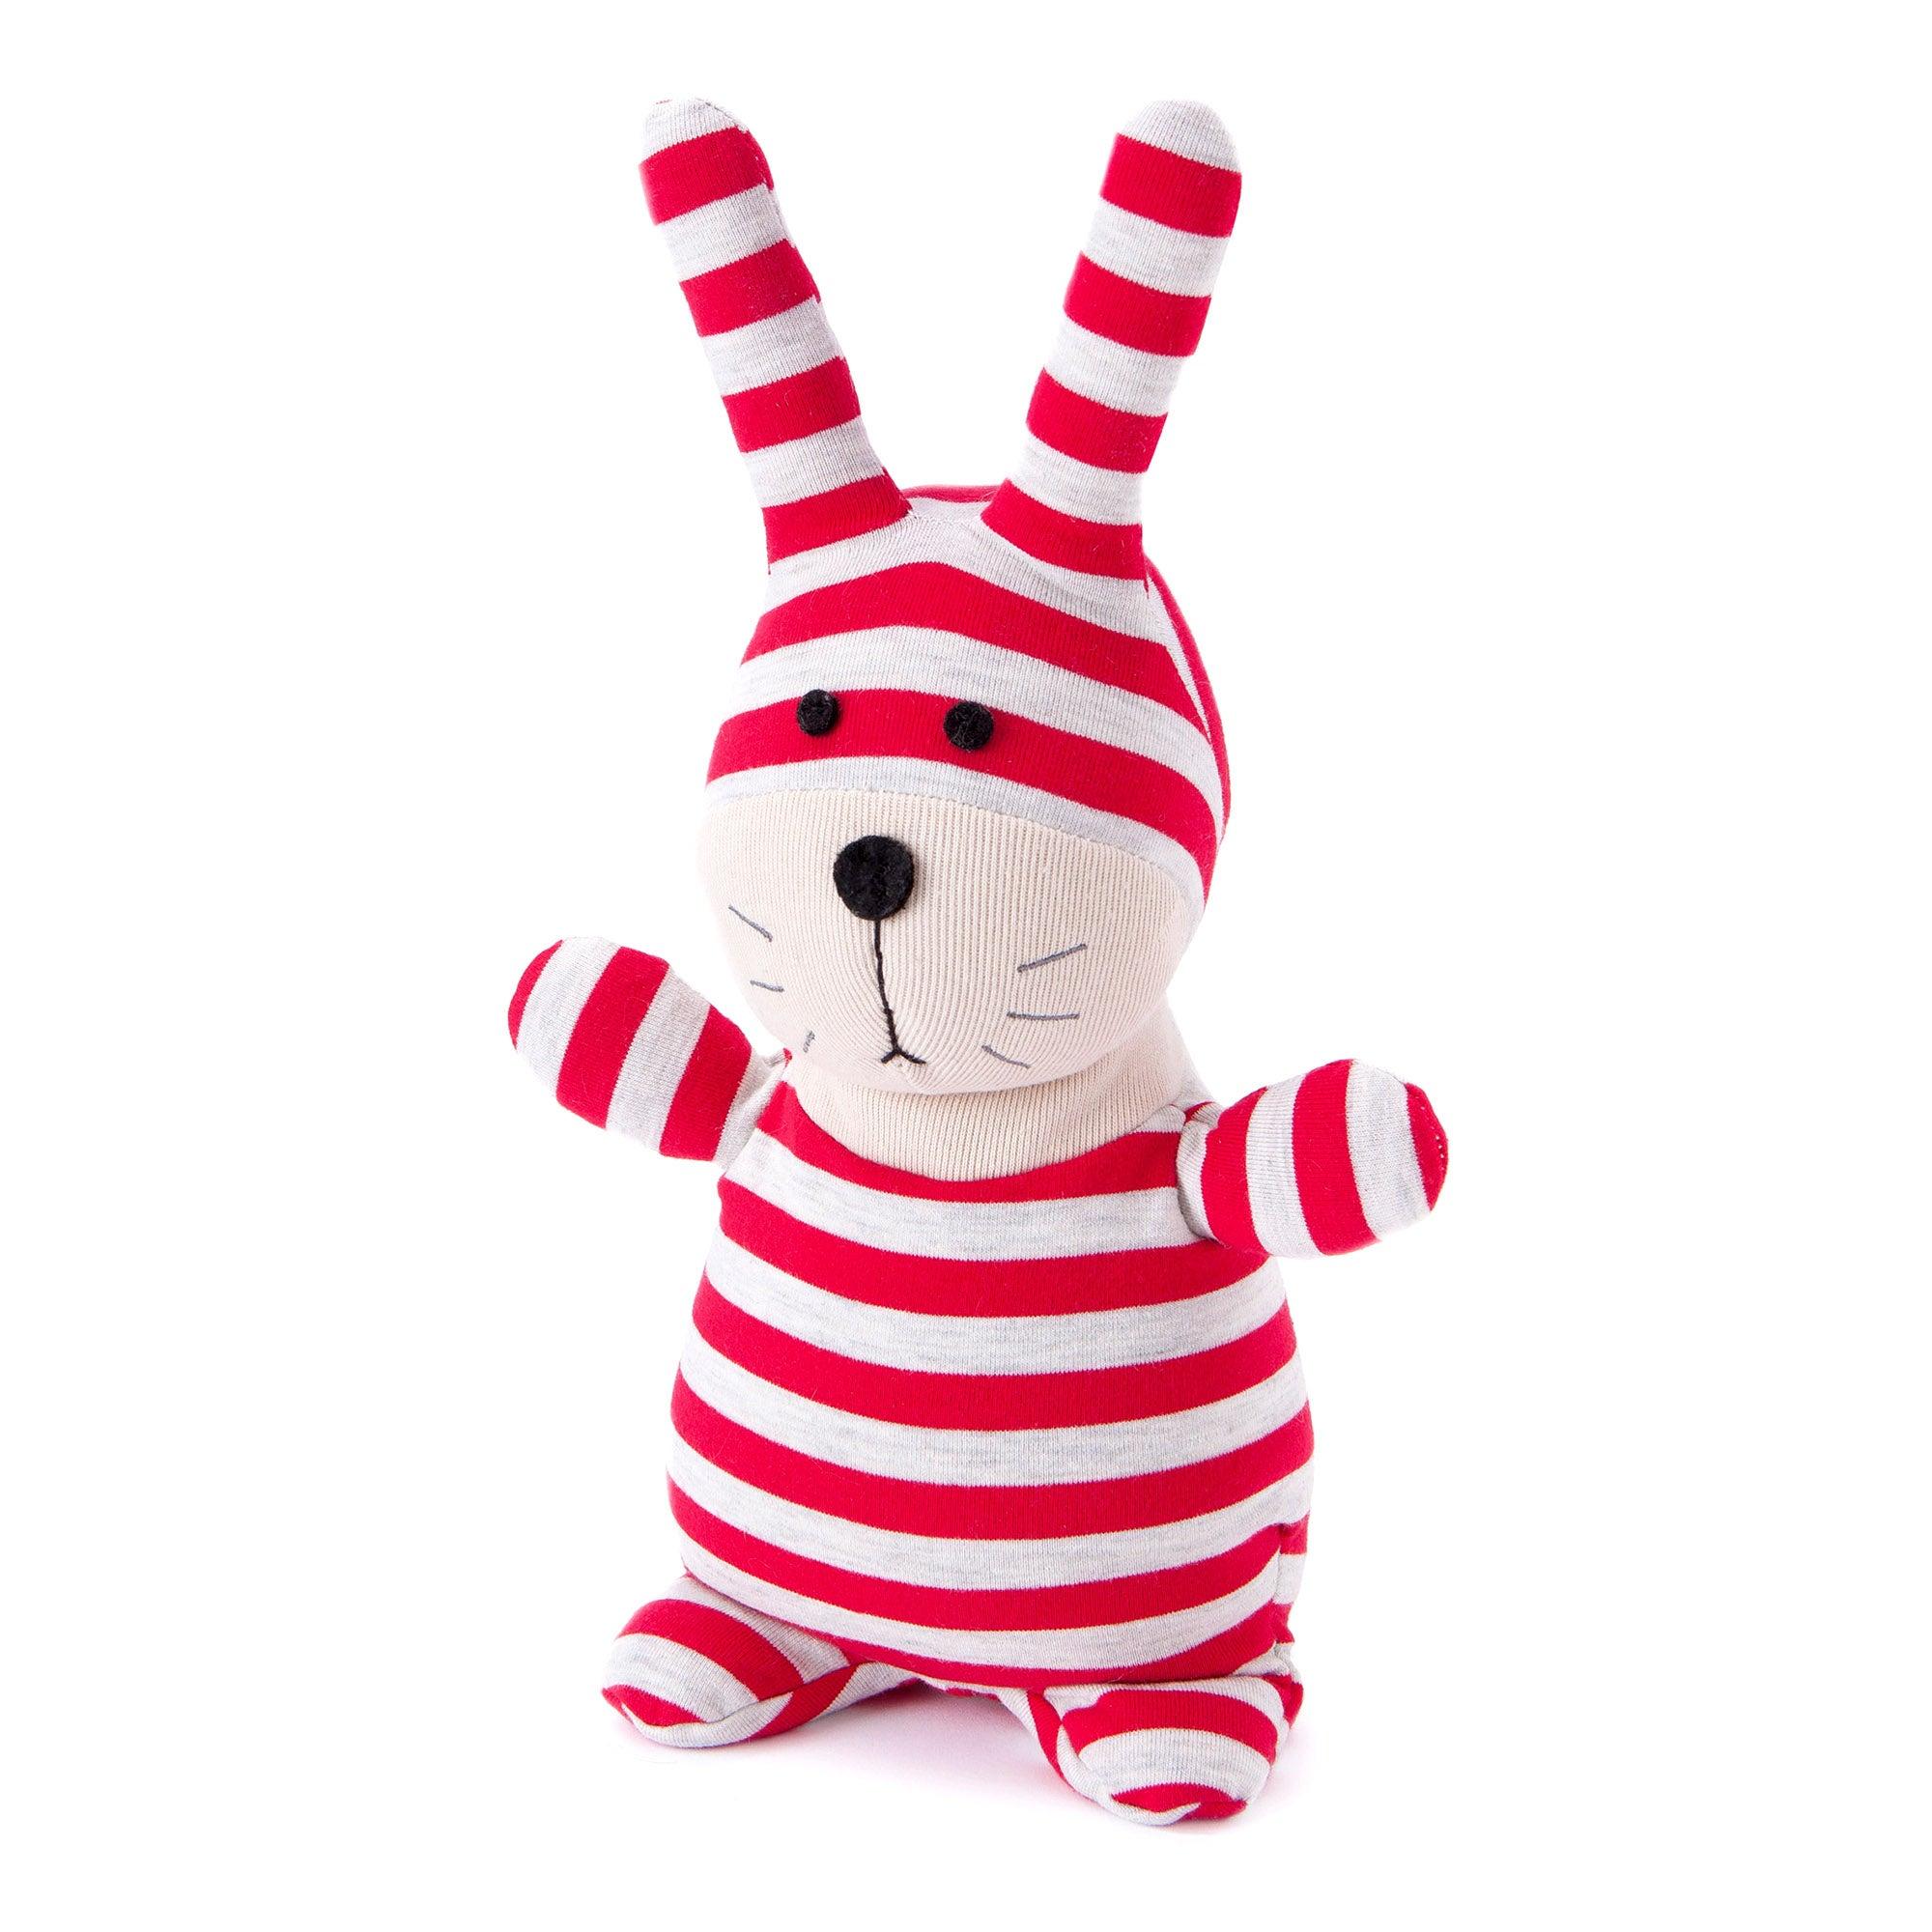 Kids Socky Dolls Microwavable Bunny